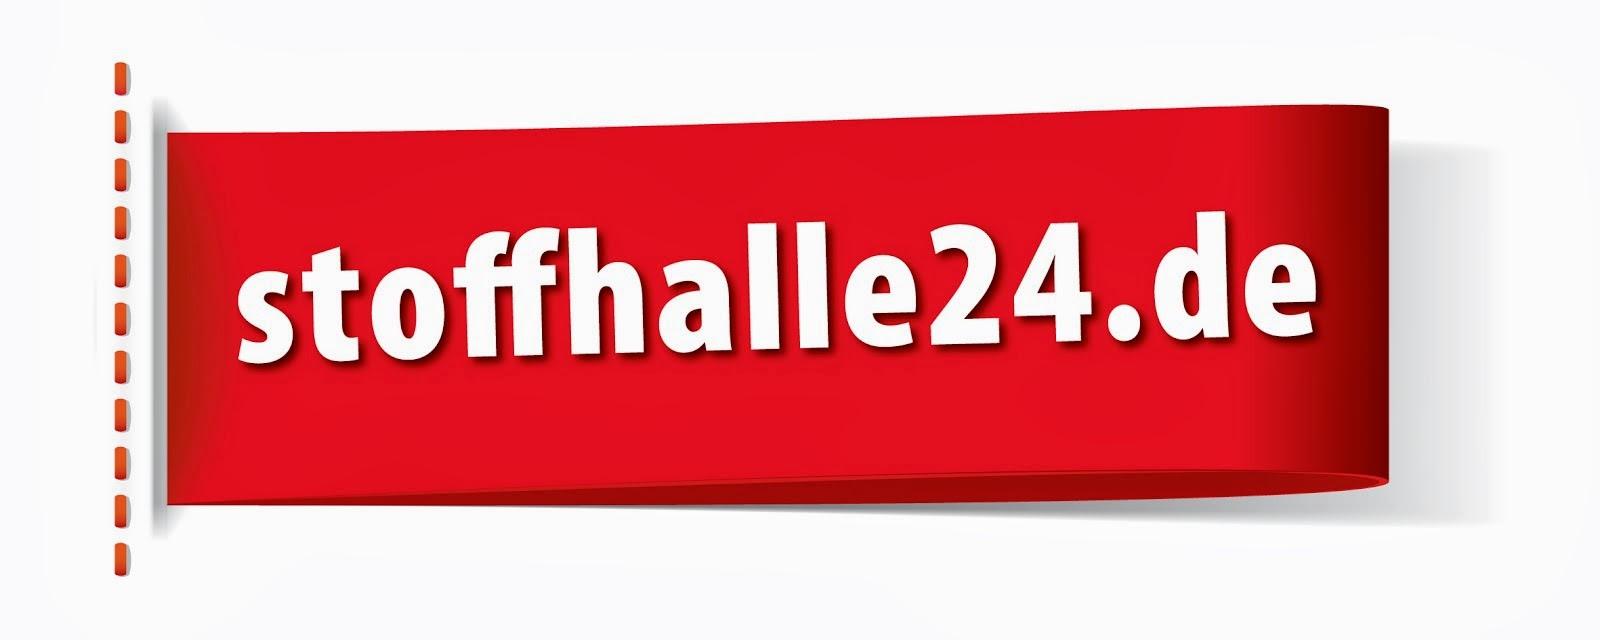 Stoffhalle24.de